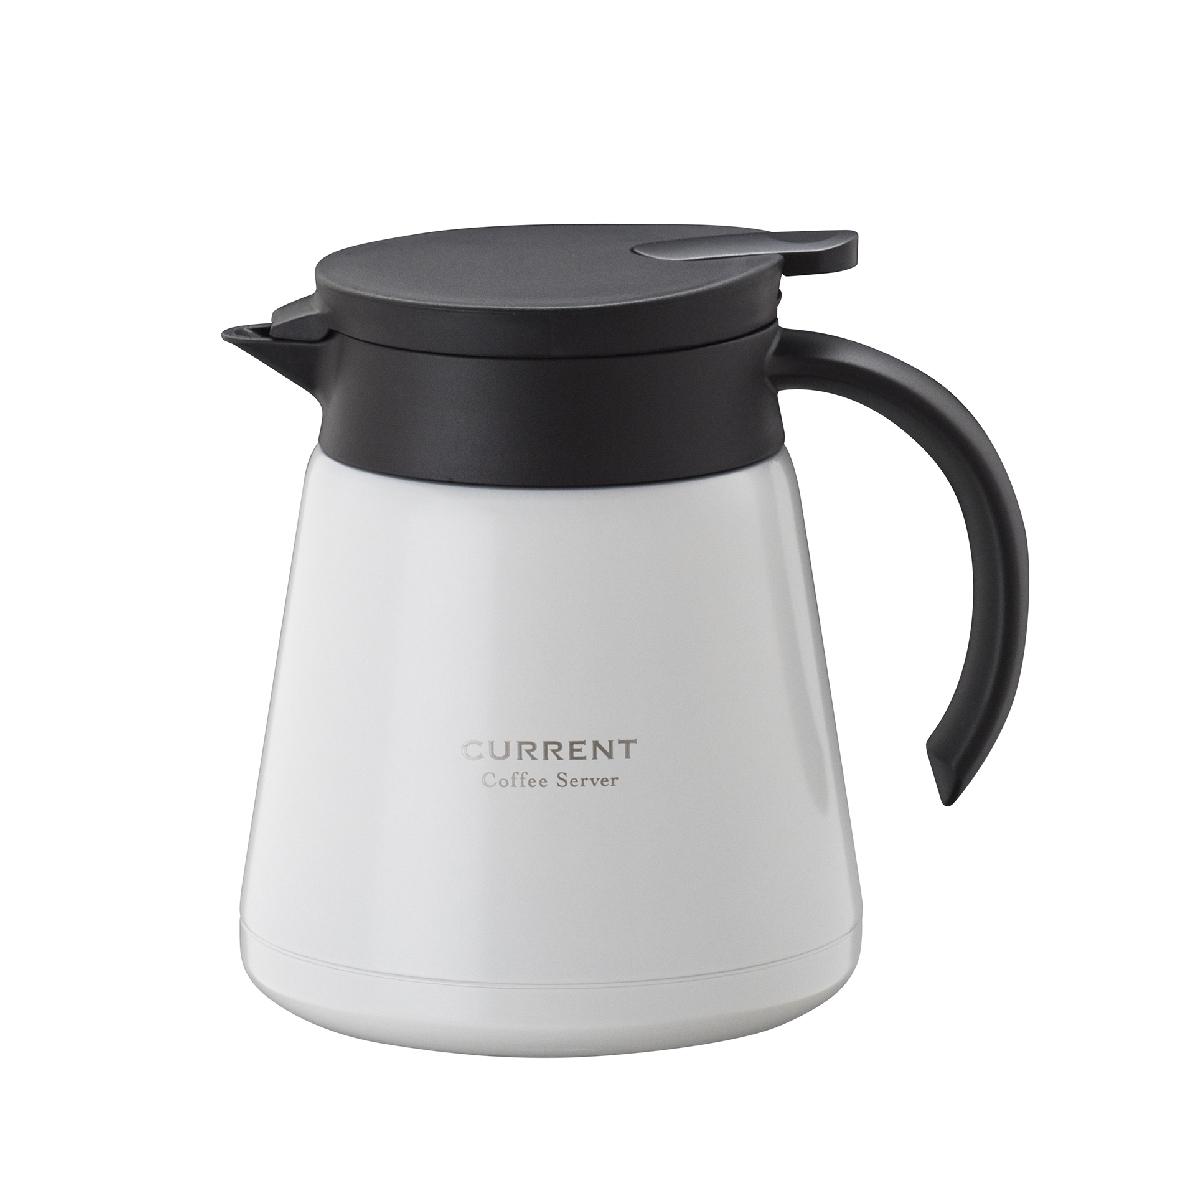 CURRENT コーヒーサーバー 800ml ホワイト